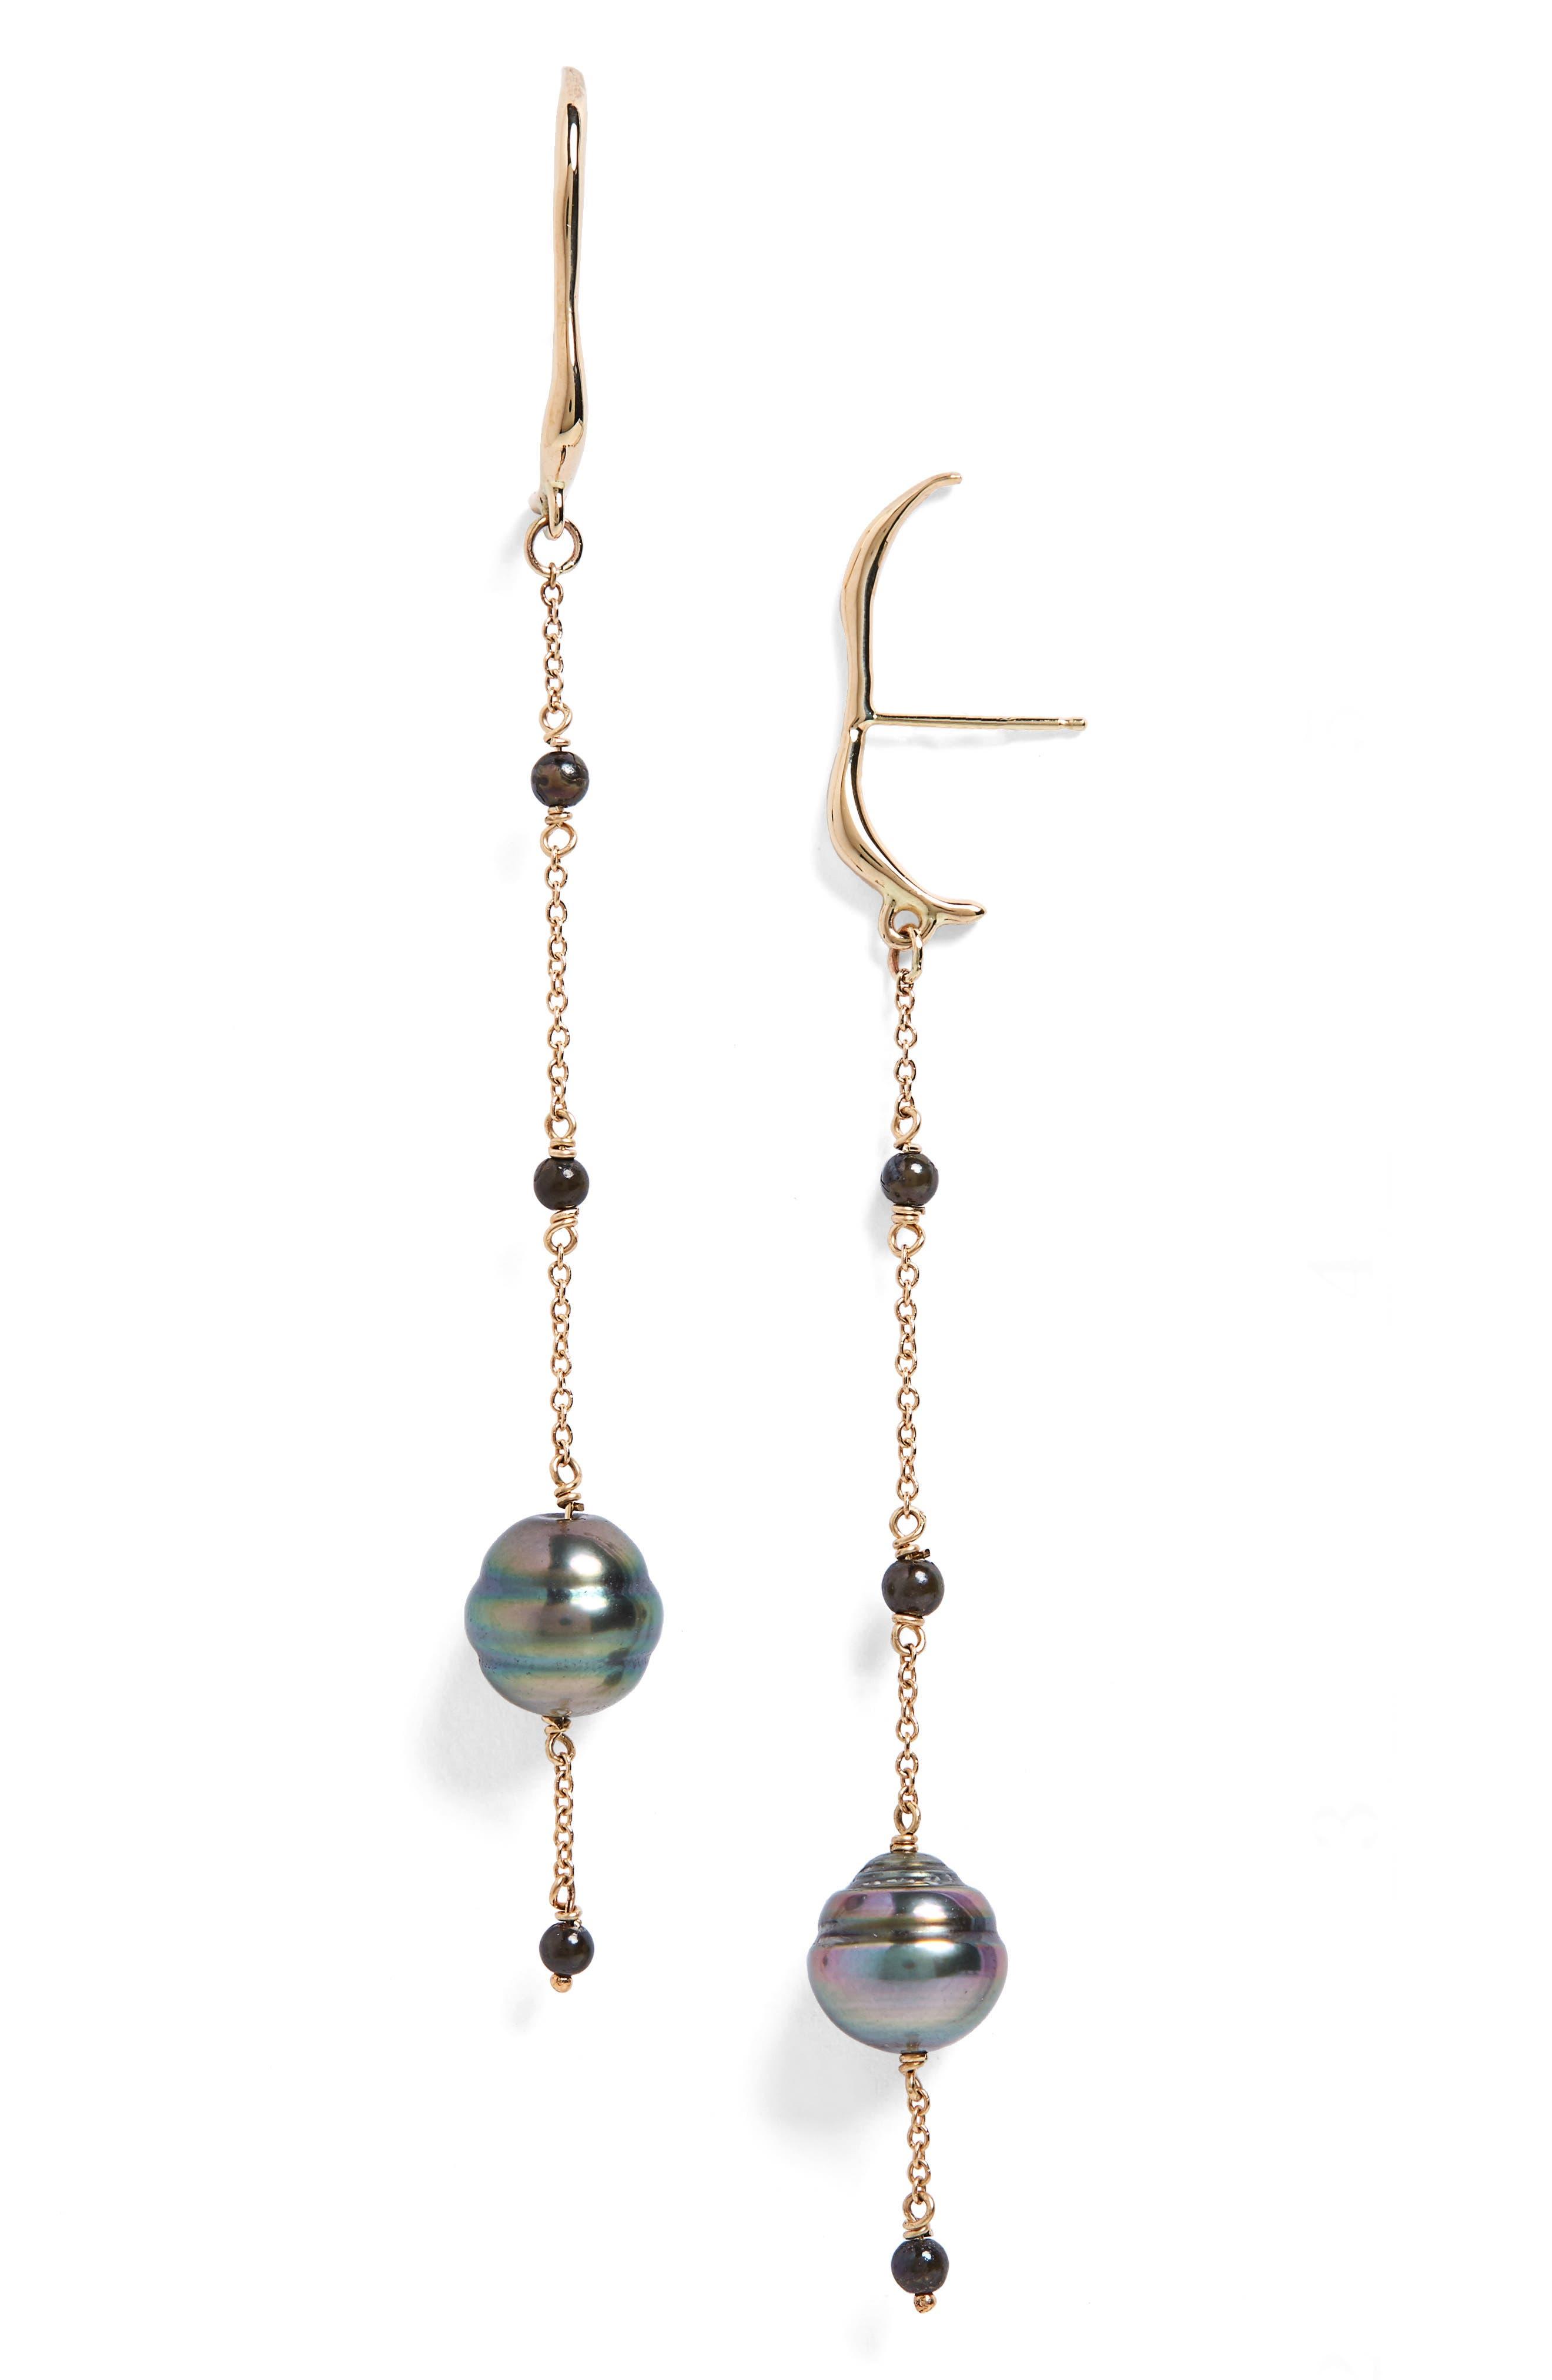 Aura Cultured Pearl Drop Earrings,                             Main thumbnail 1, color,                             Gold/ Black Pearl